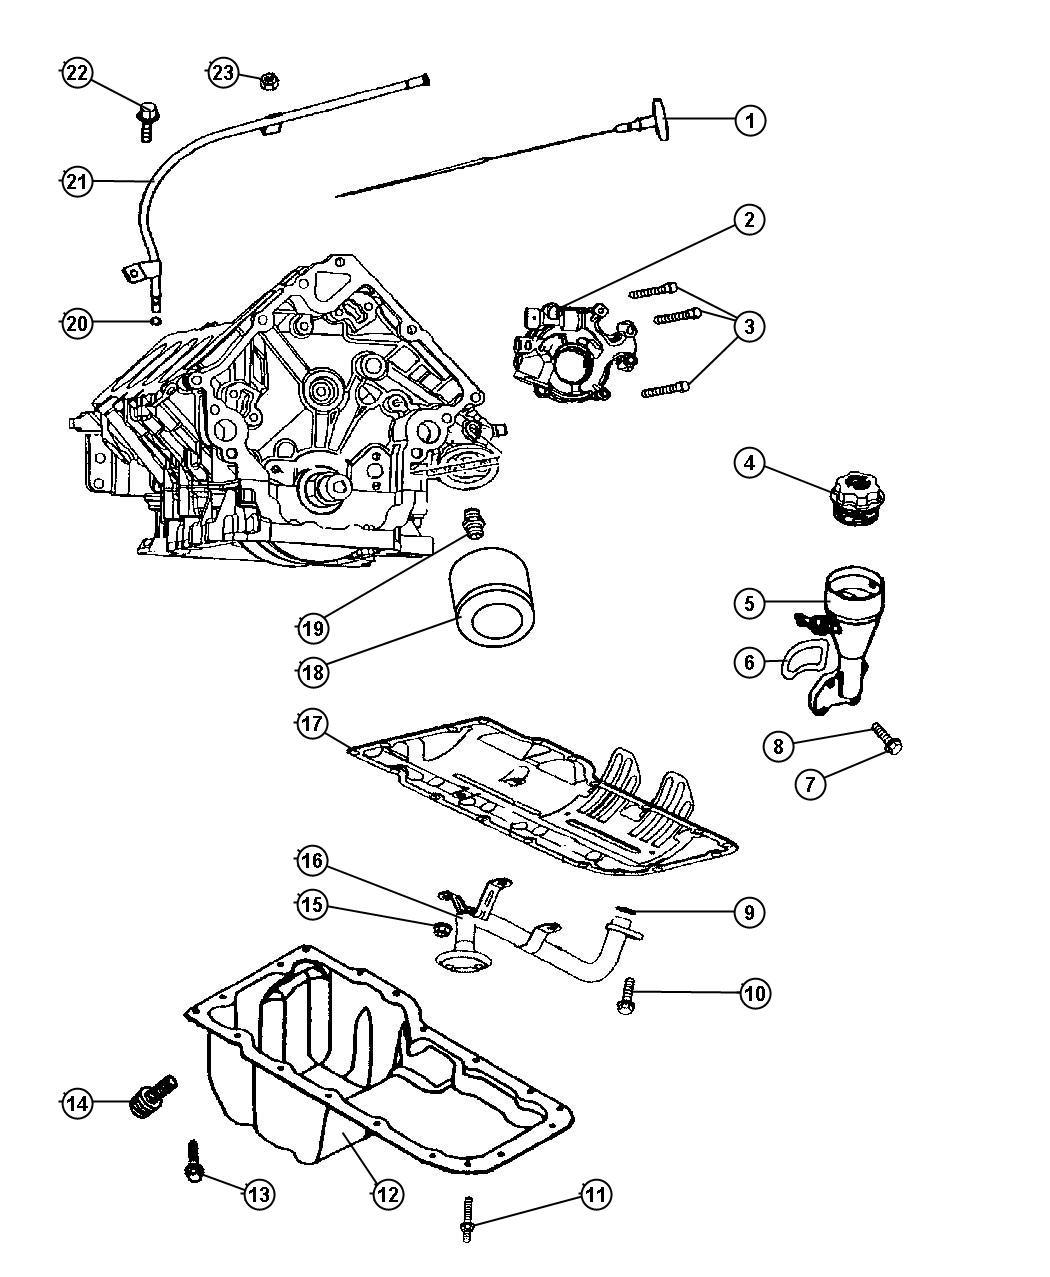 Dodge Ram 1500 Indicator. Engine oil level. Blocks